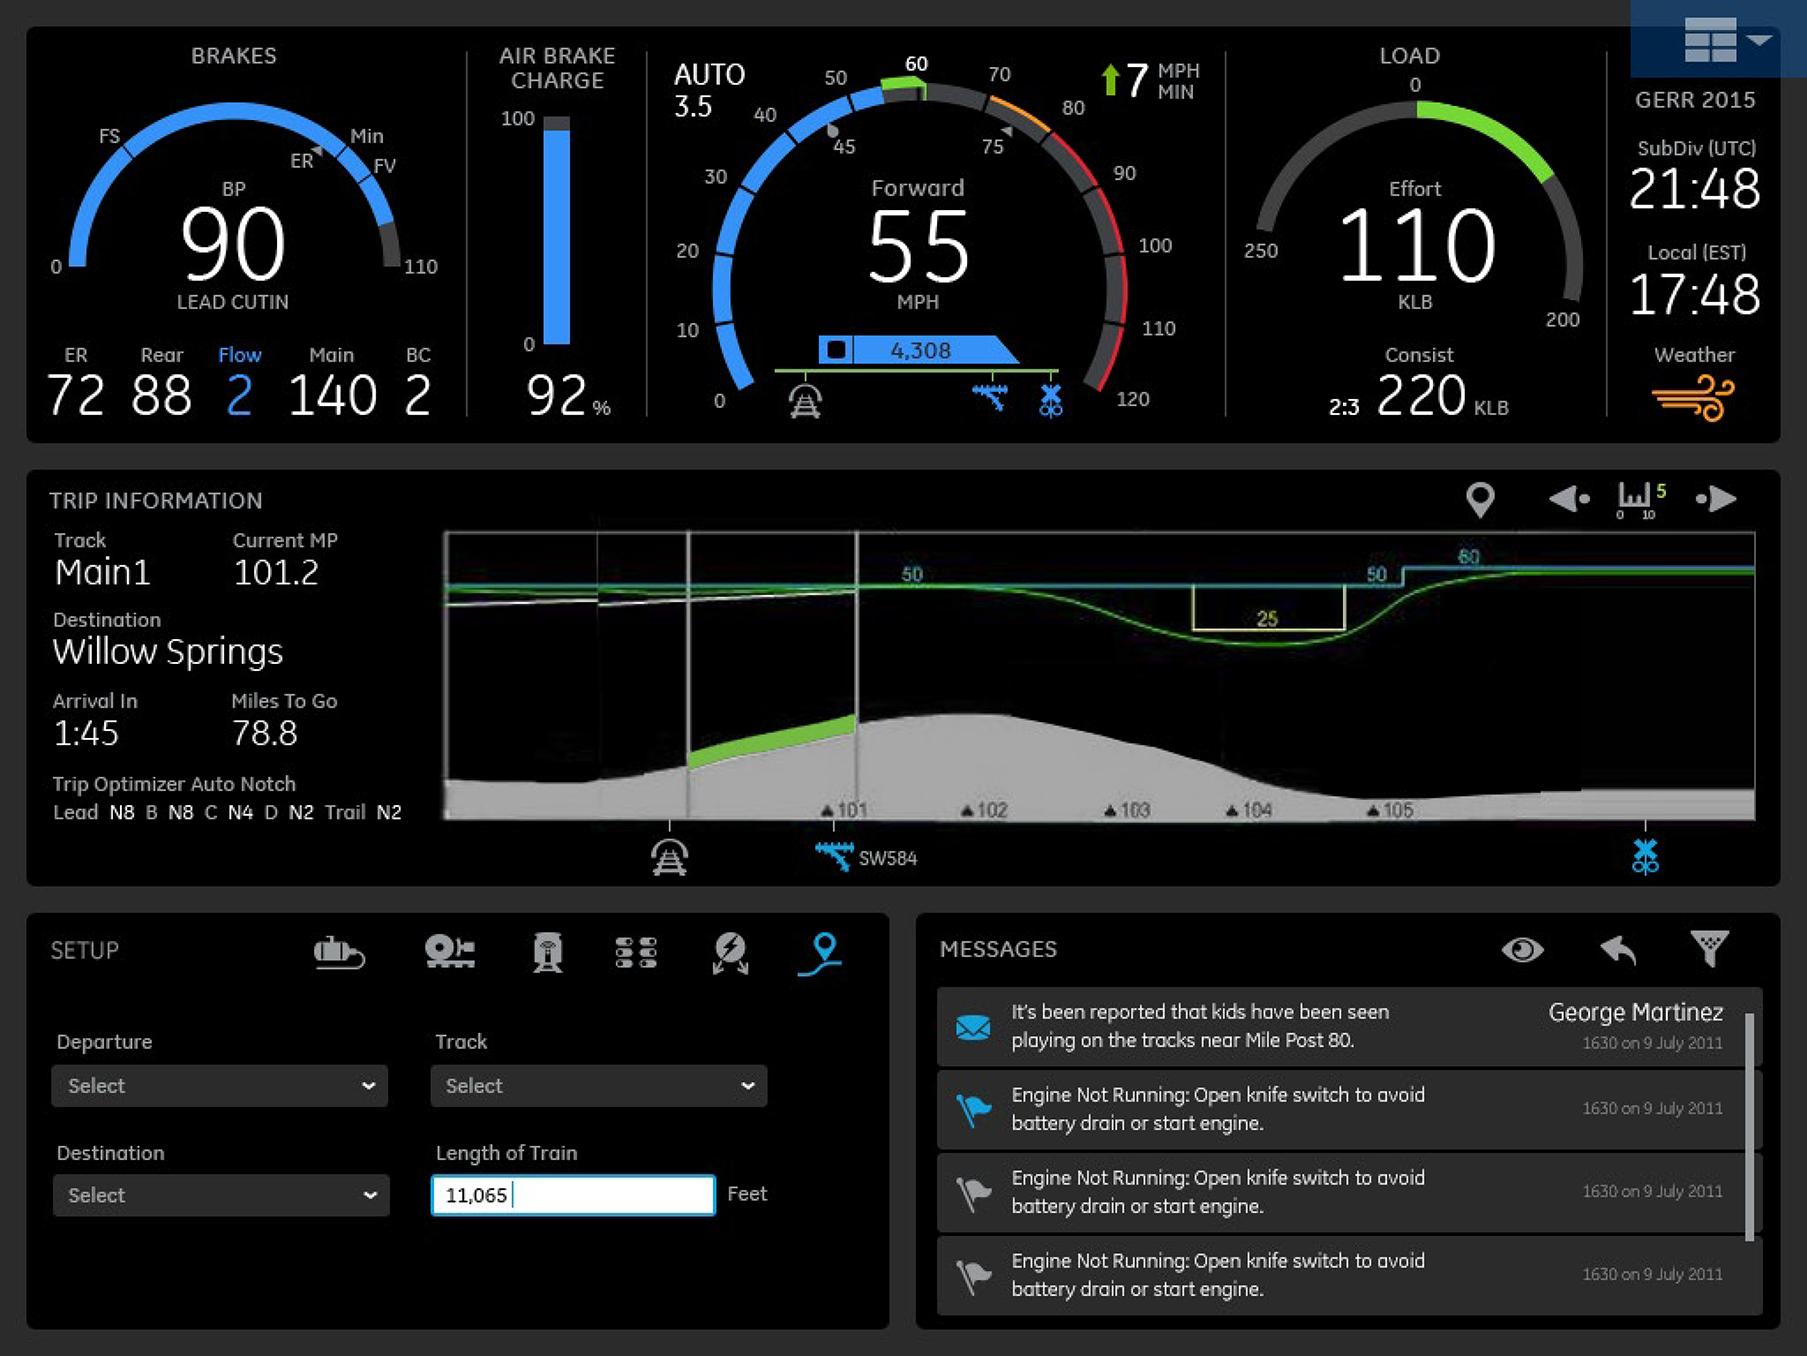 Locomotive HMI with Industrial IoT Interface